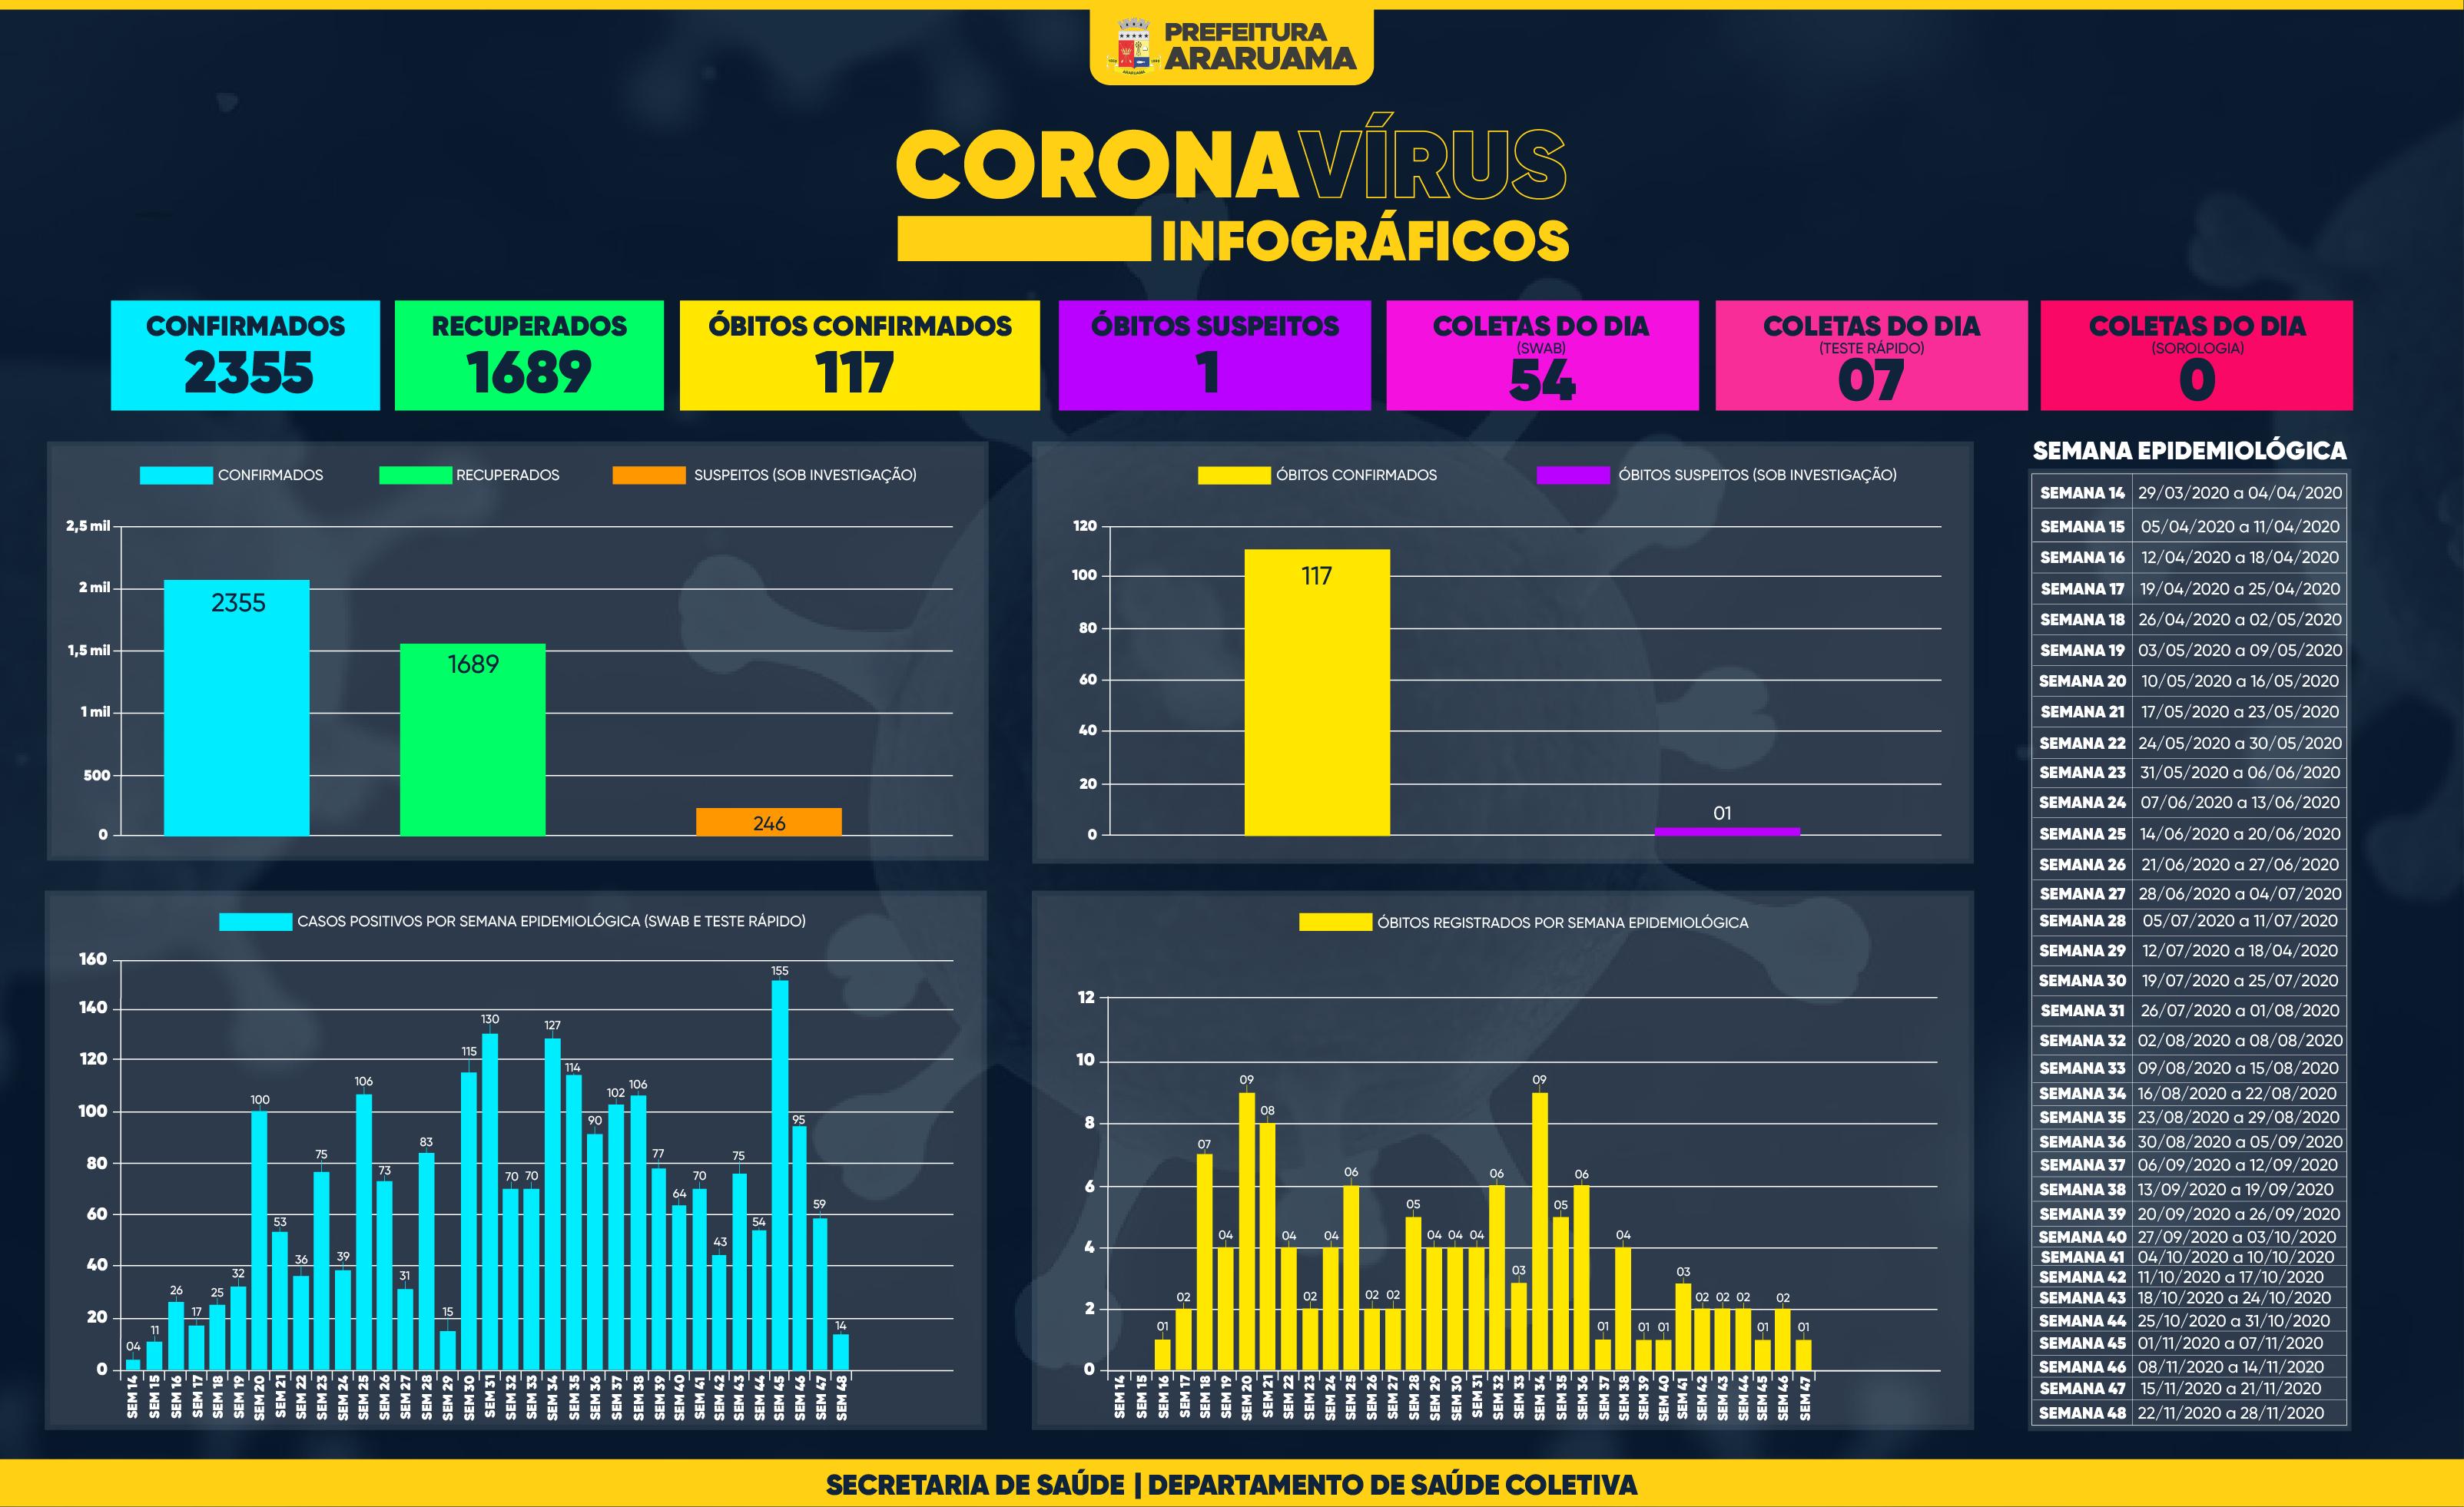 Painel de Monitoramento COVID-19 — Semana 48 — 25 de novembro de 2020